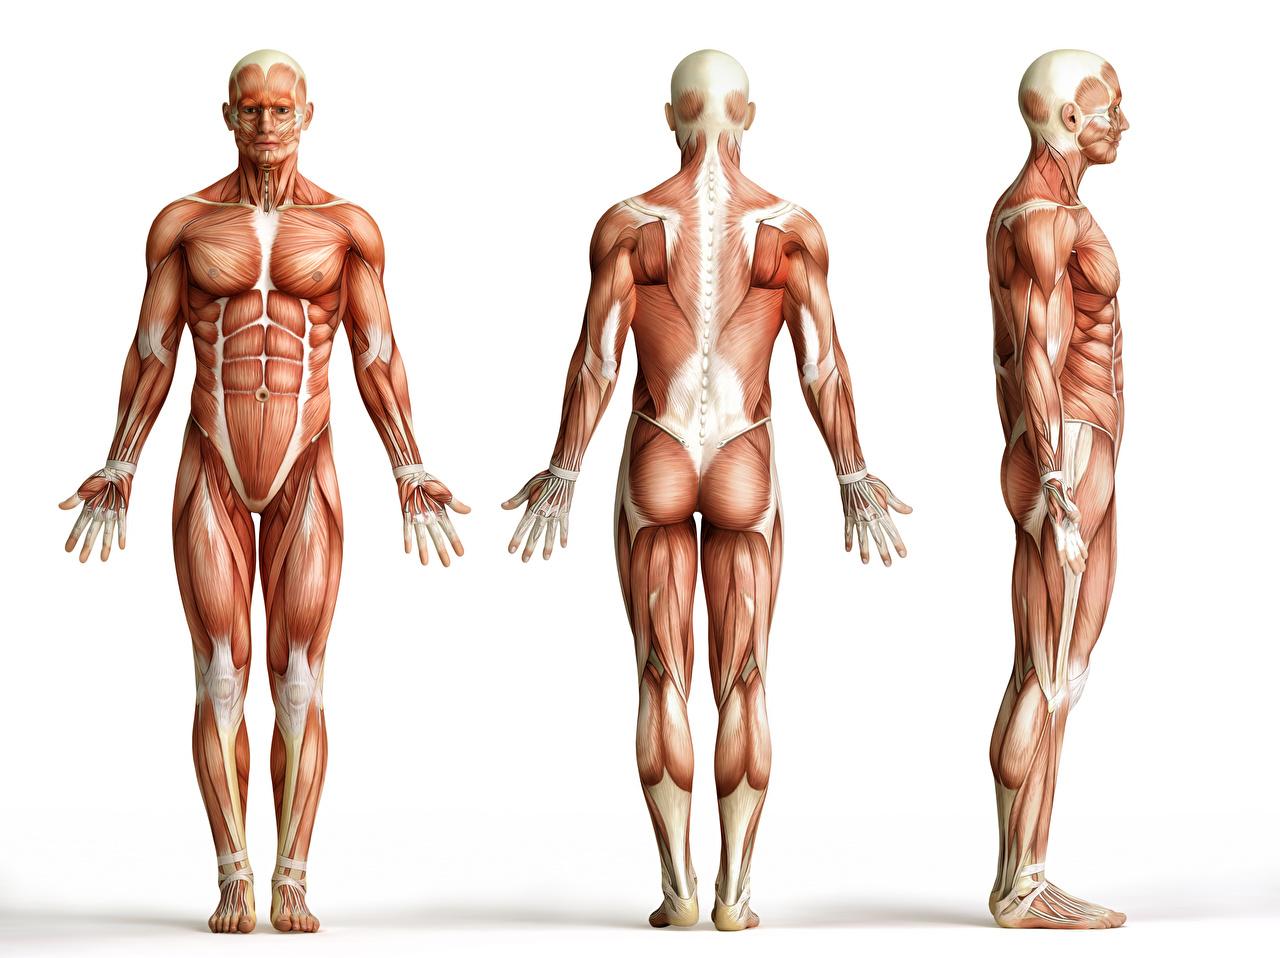 Bear muscle anatomy